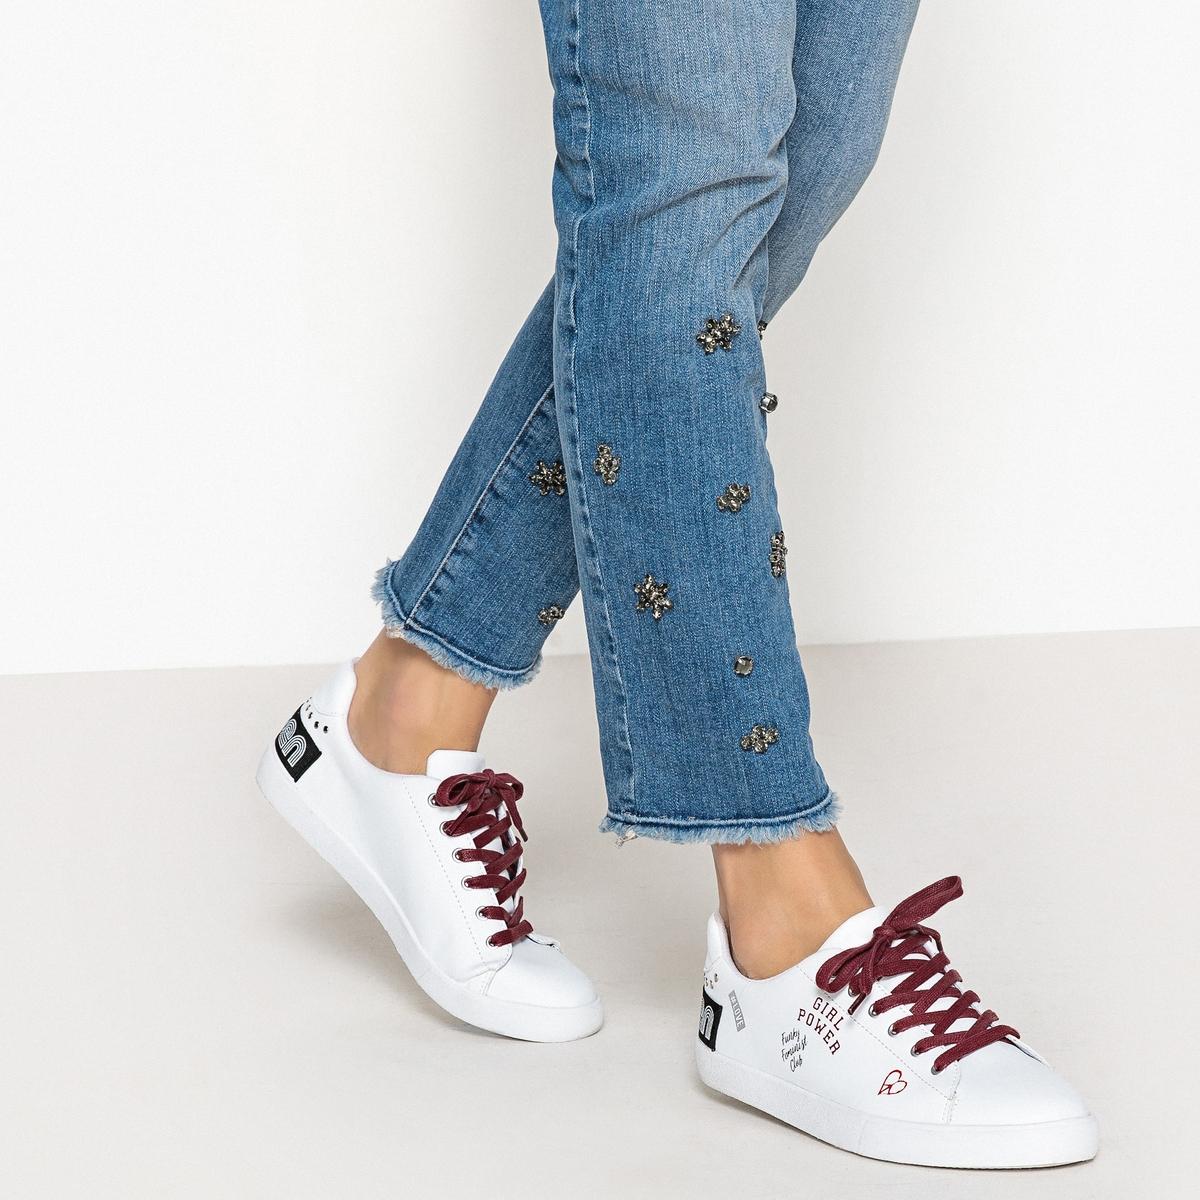 Zapatillas con mensaje feminista